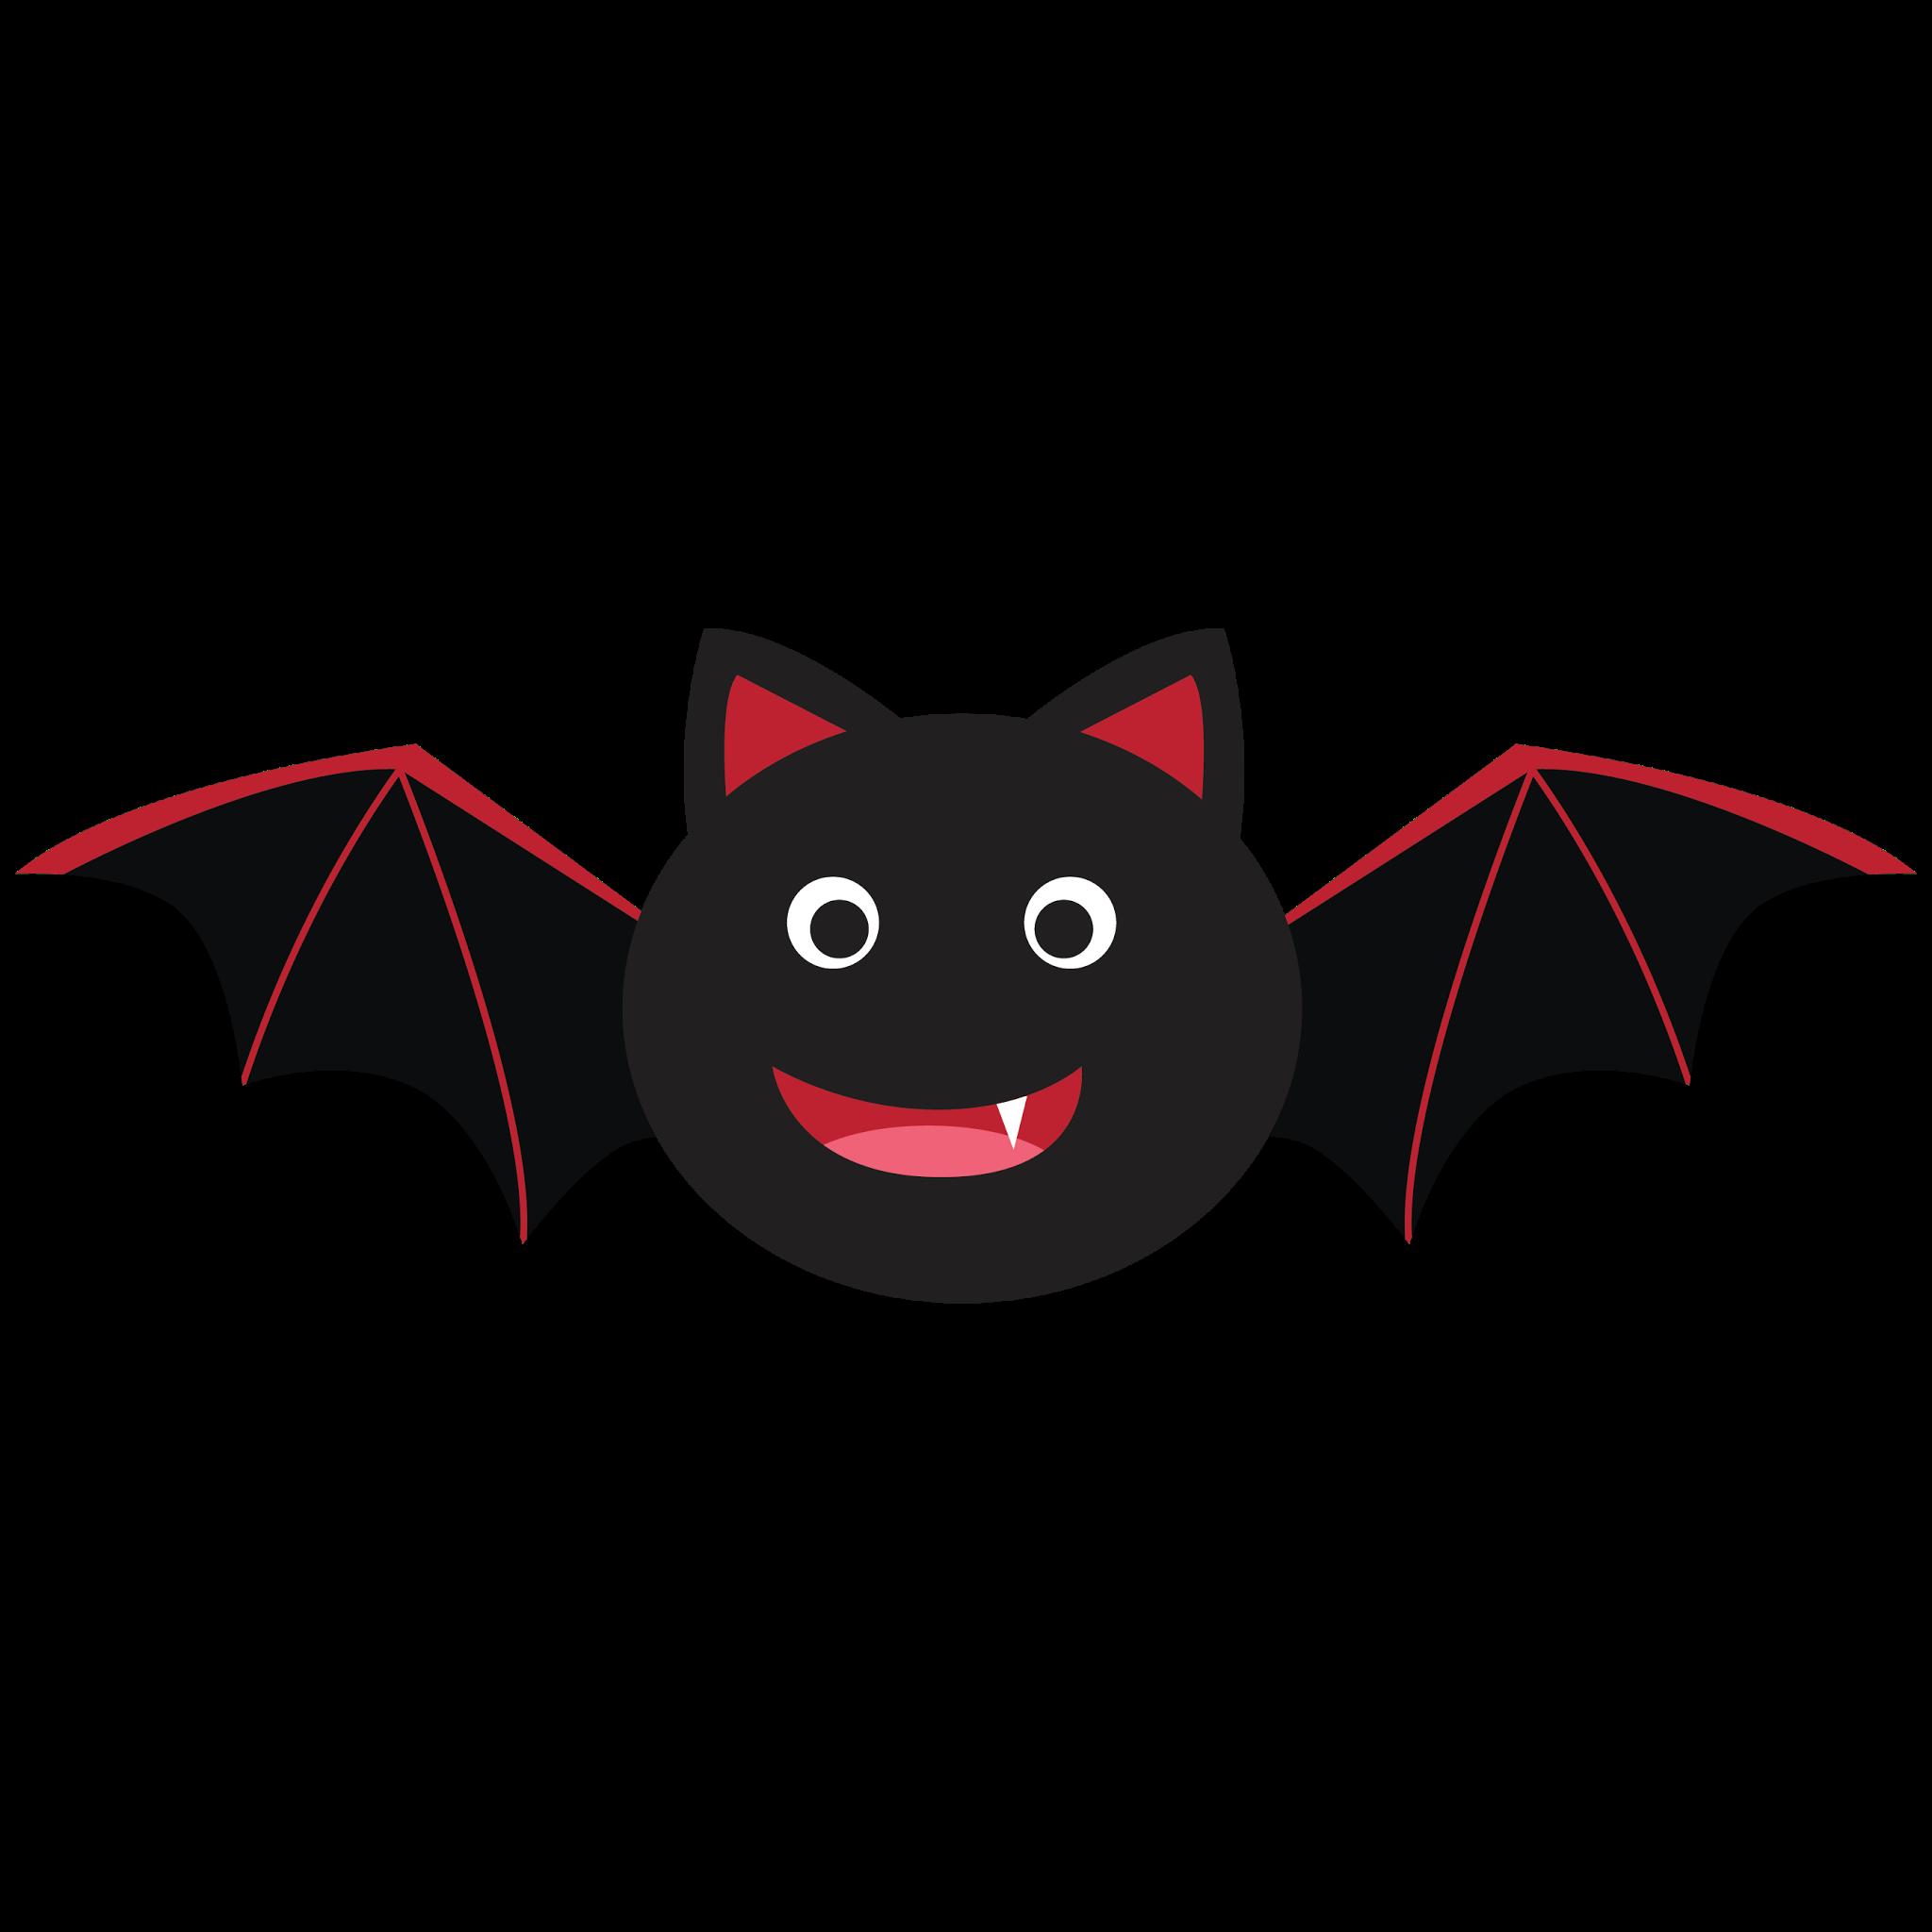 Number 1 clipart kid. Cute bat